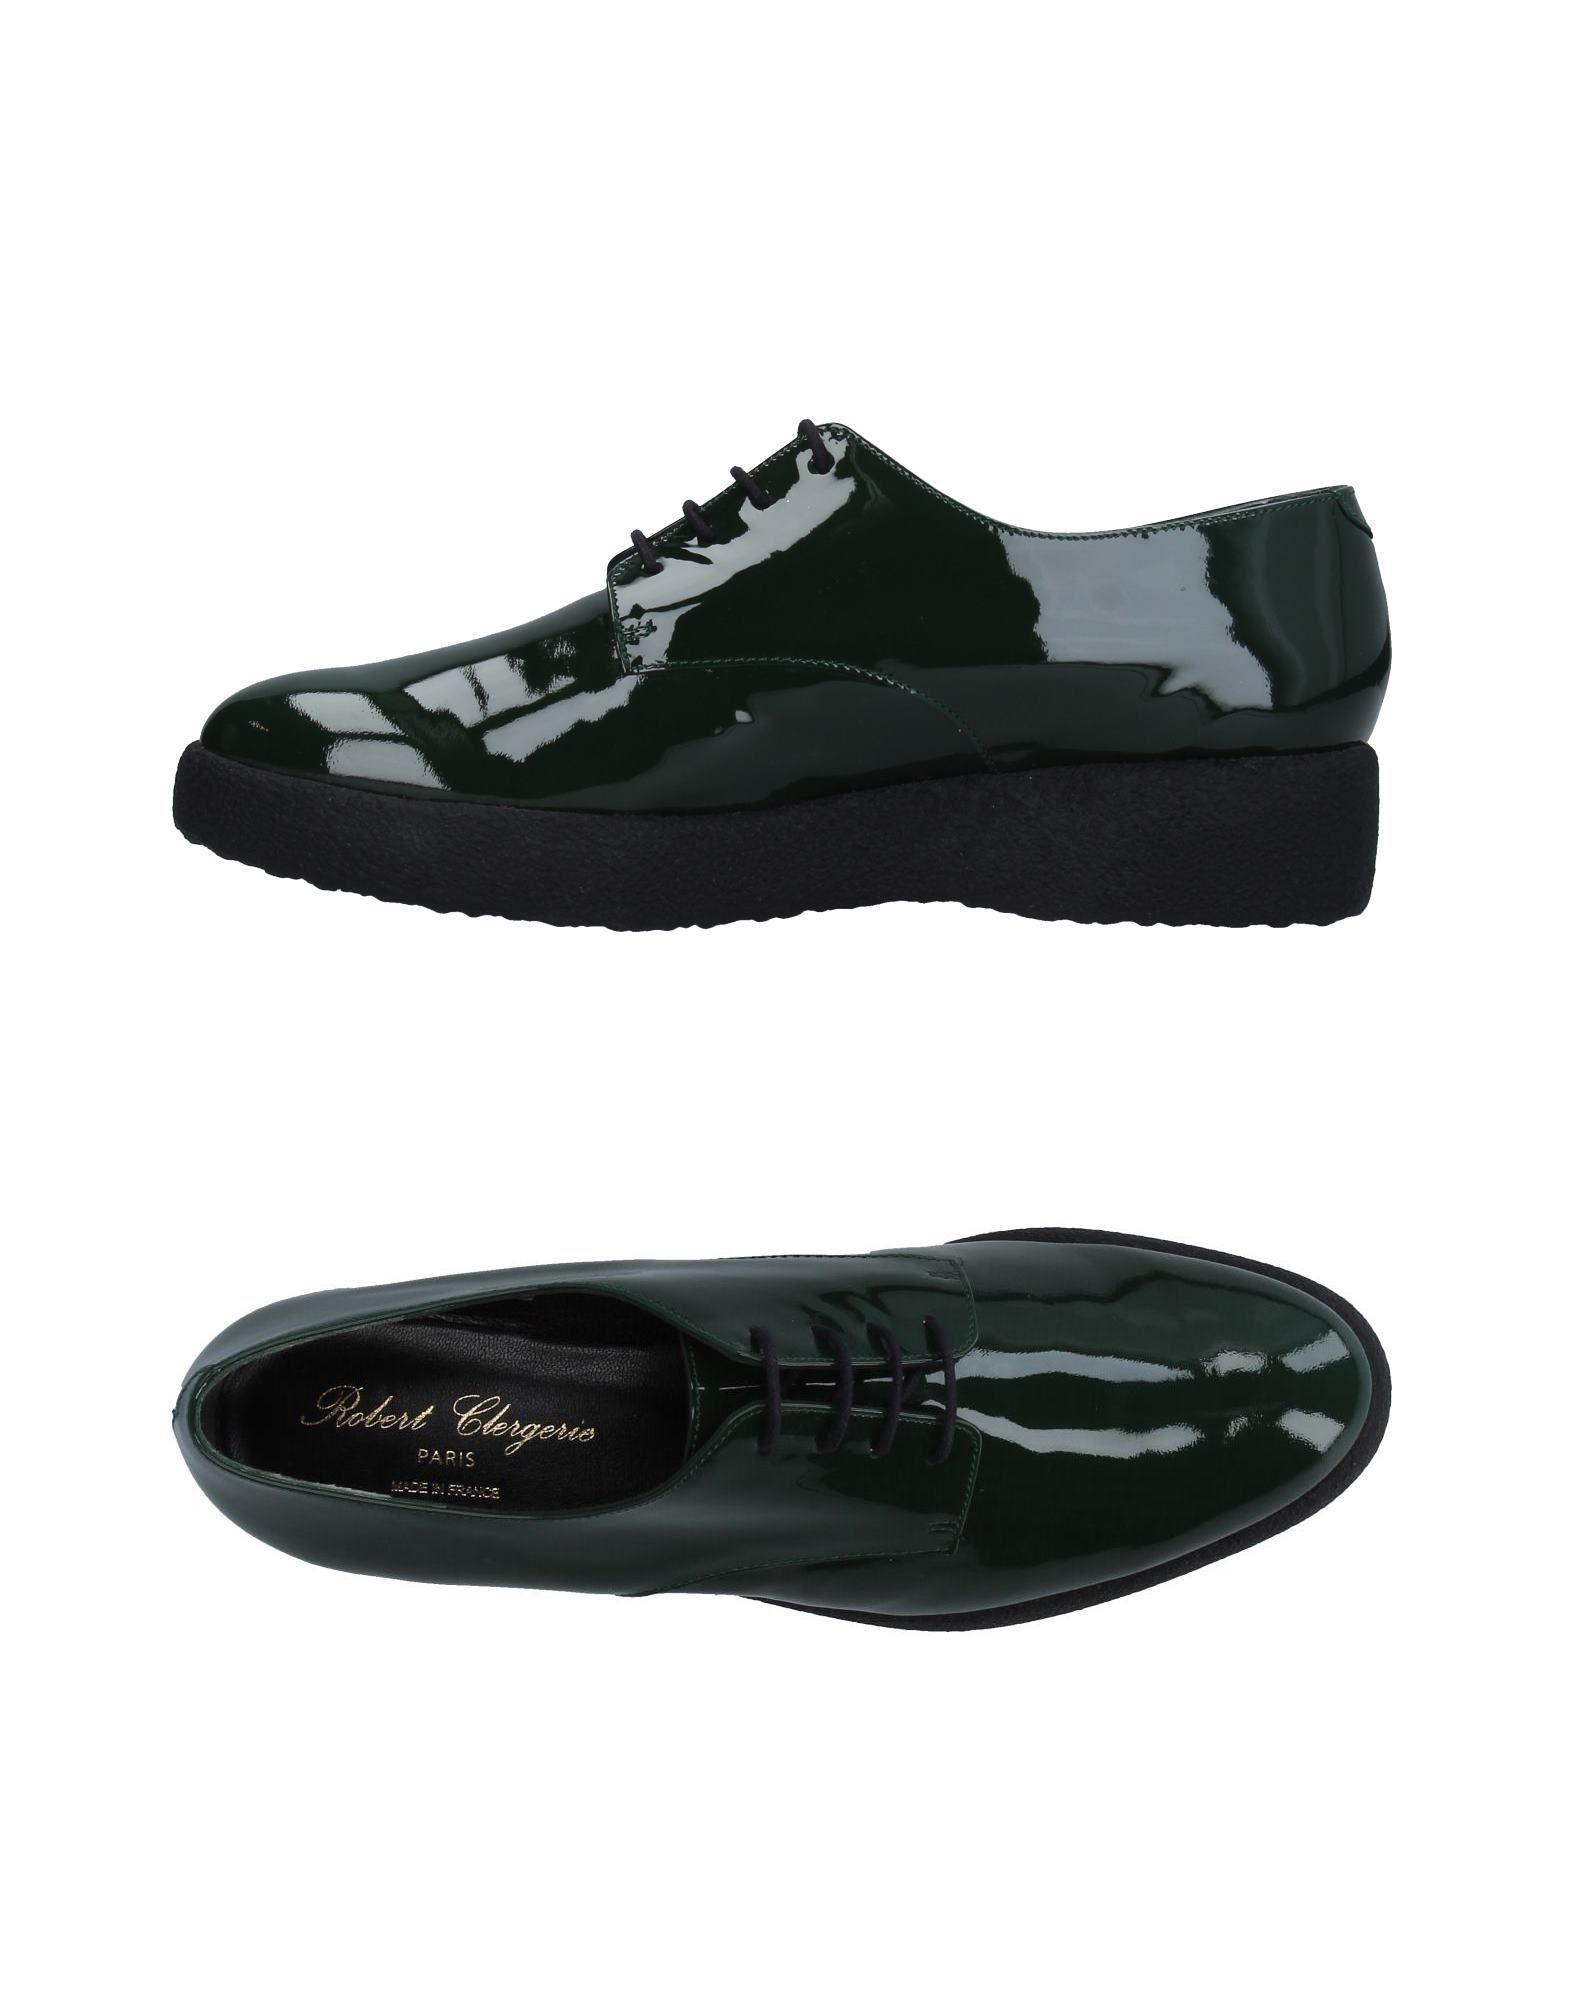 Chaussures À Lacets Robert Clergerie Femme - Chaussures À Lacets Robert Clergerie sur